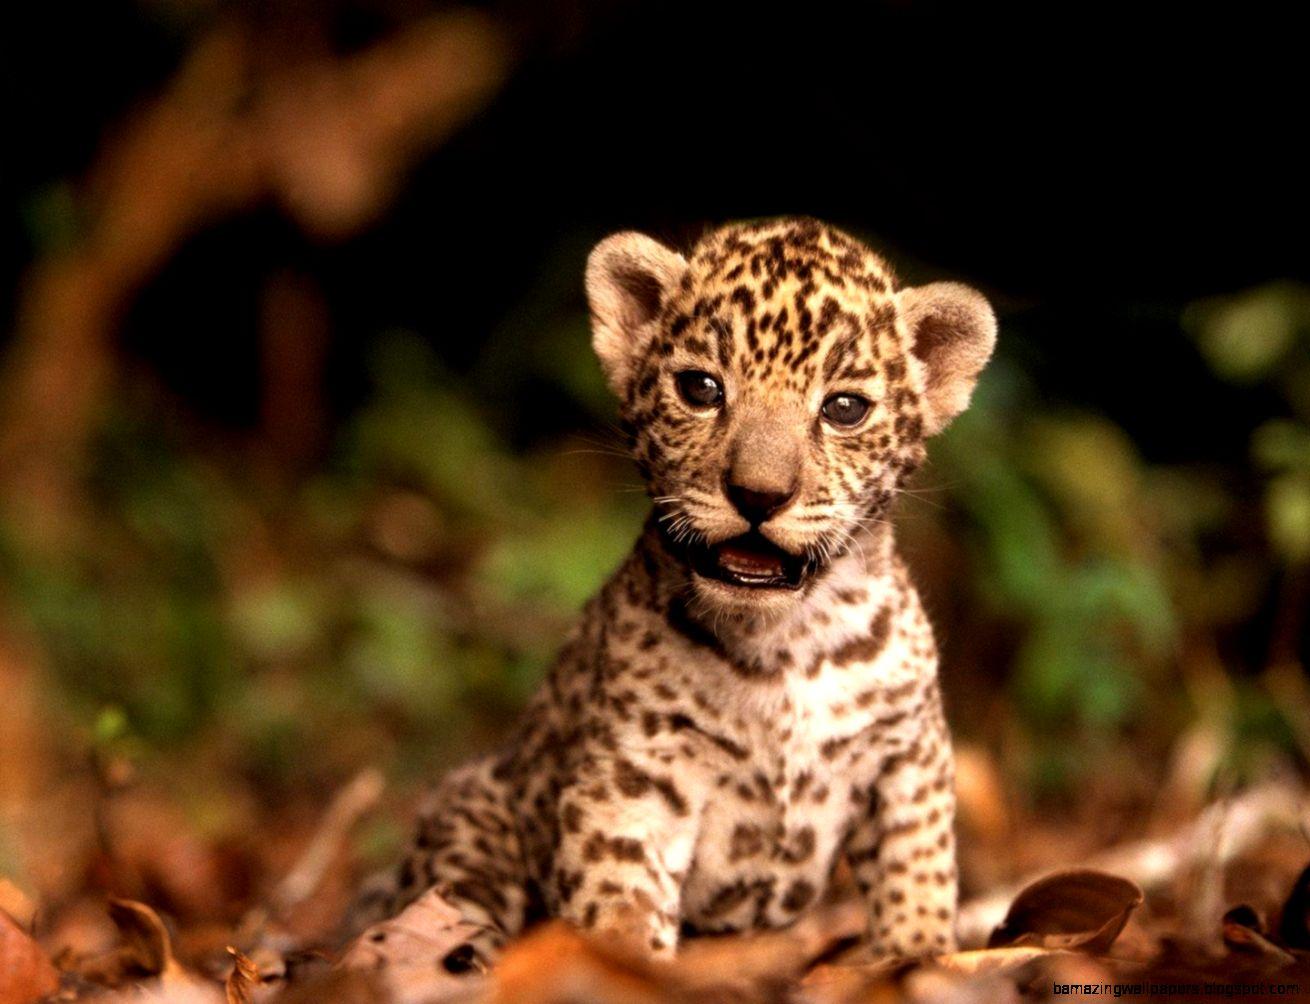 Sweet Baby Leopard Wallpaper HD 7491 Wallpaper mobile phones hd